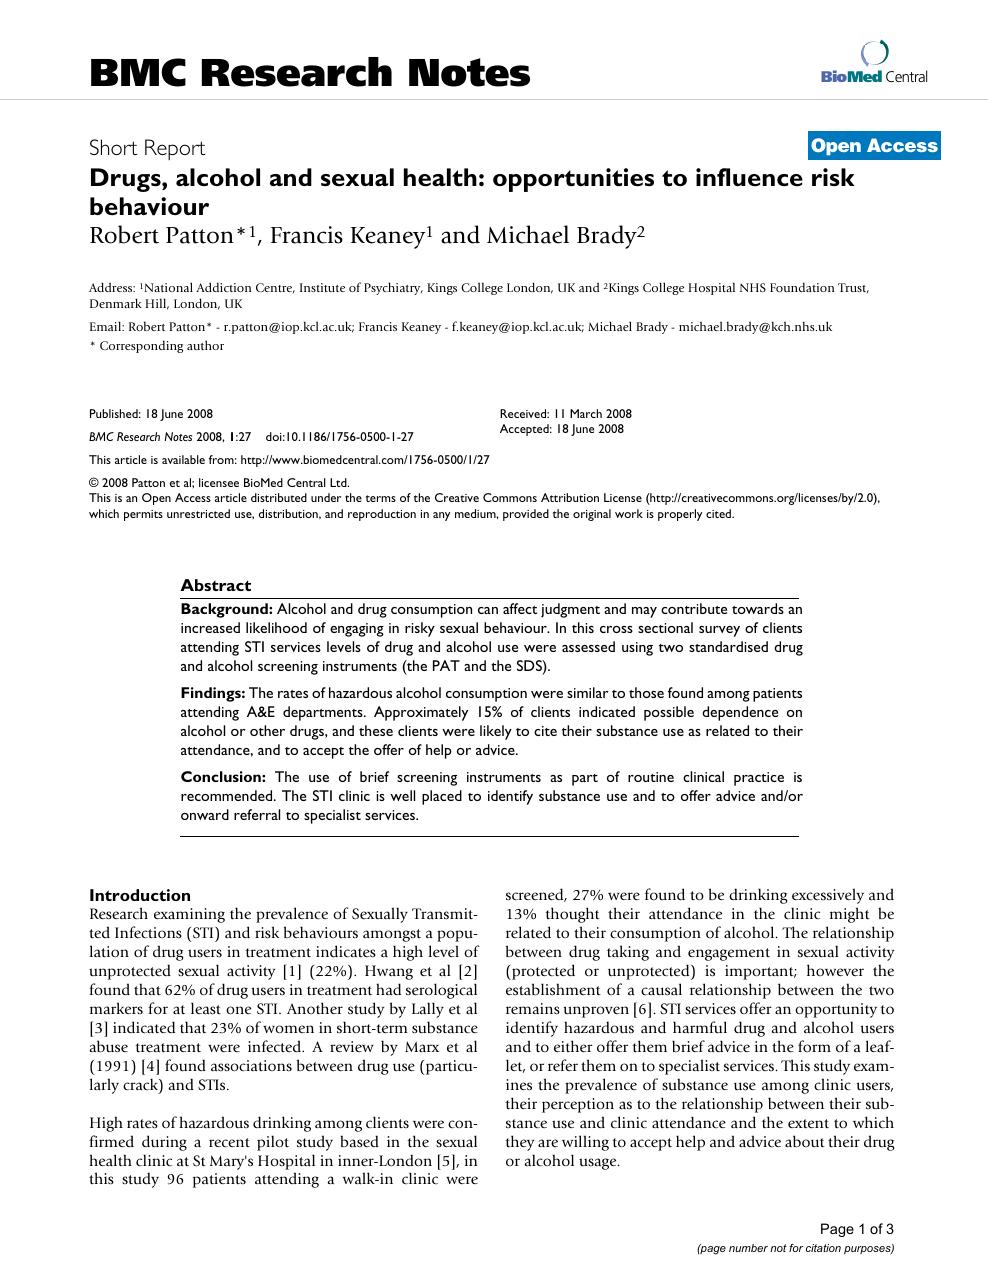 Sexual health nhs clinical trials